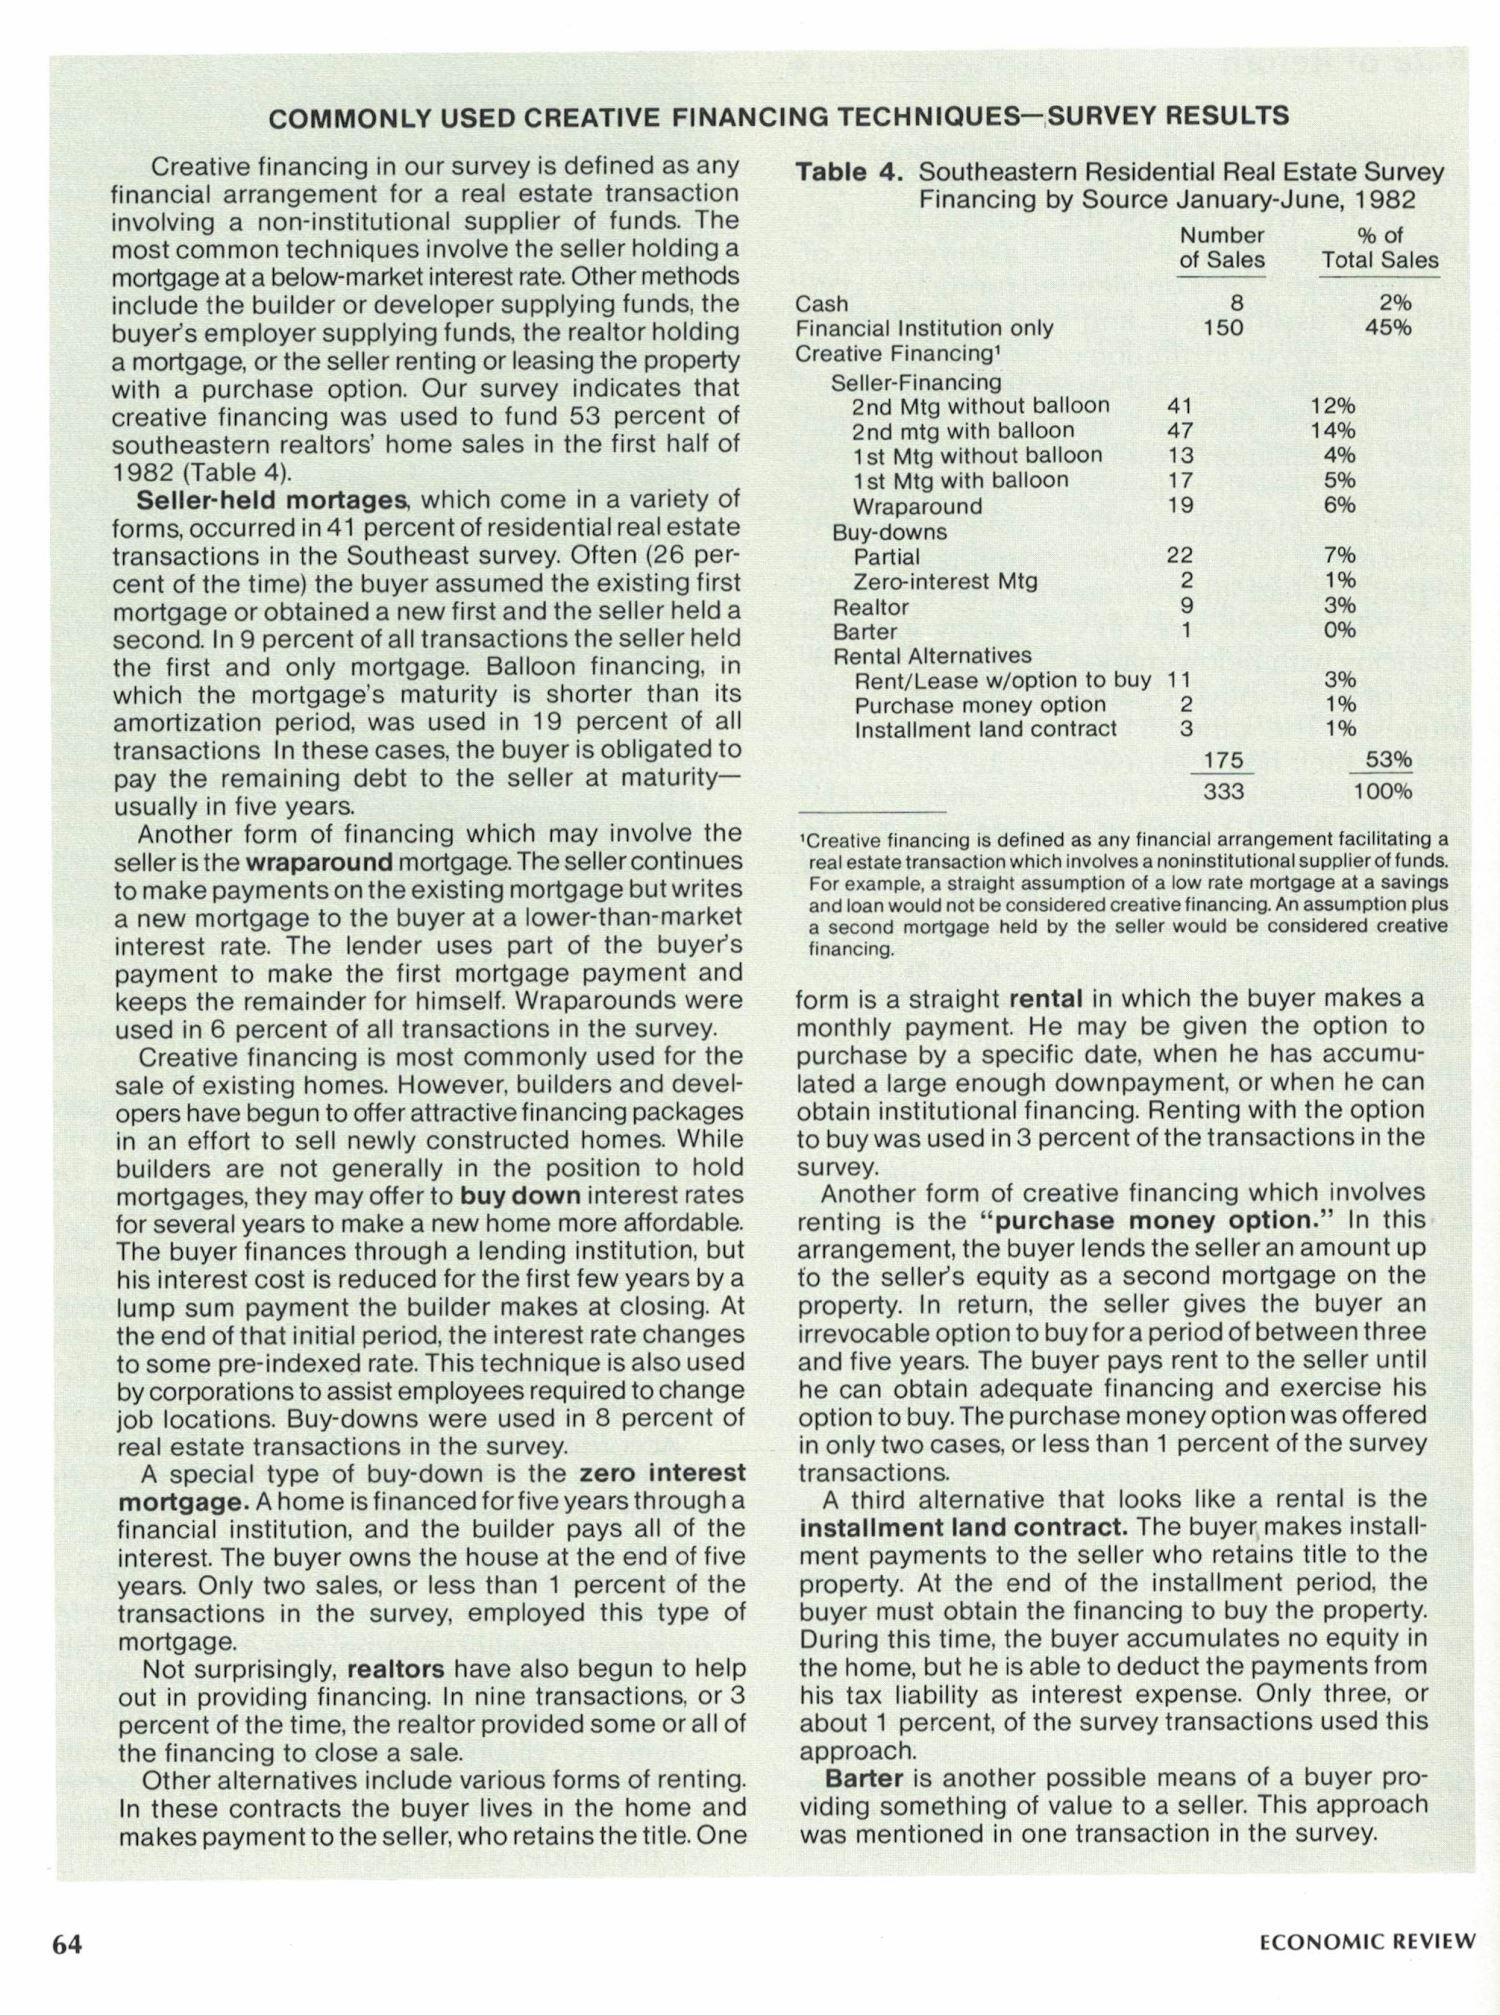 Risks-of-Creative-Financing-8.jpg